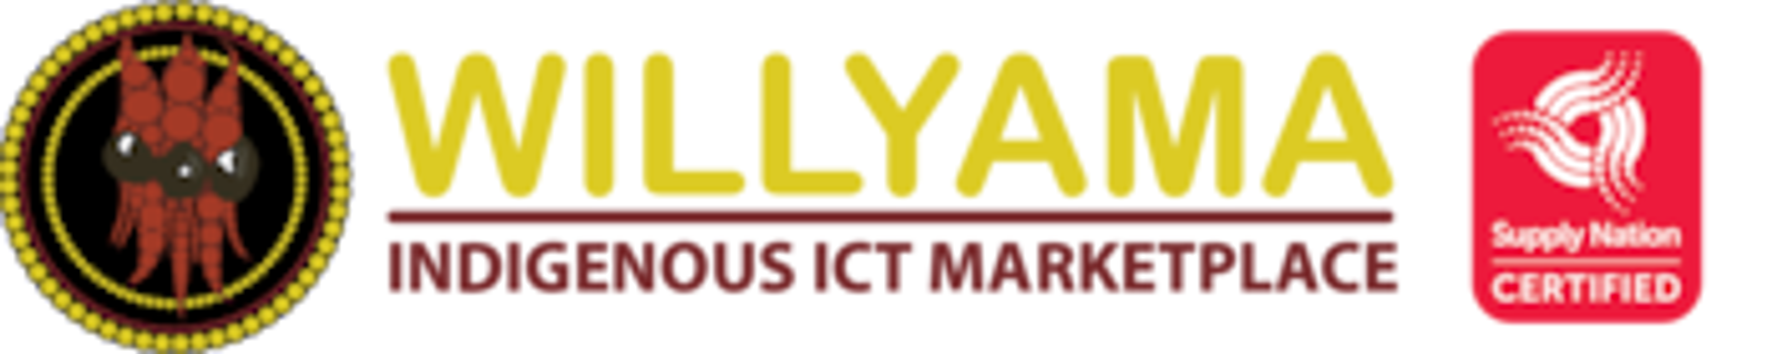 Willyama Services